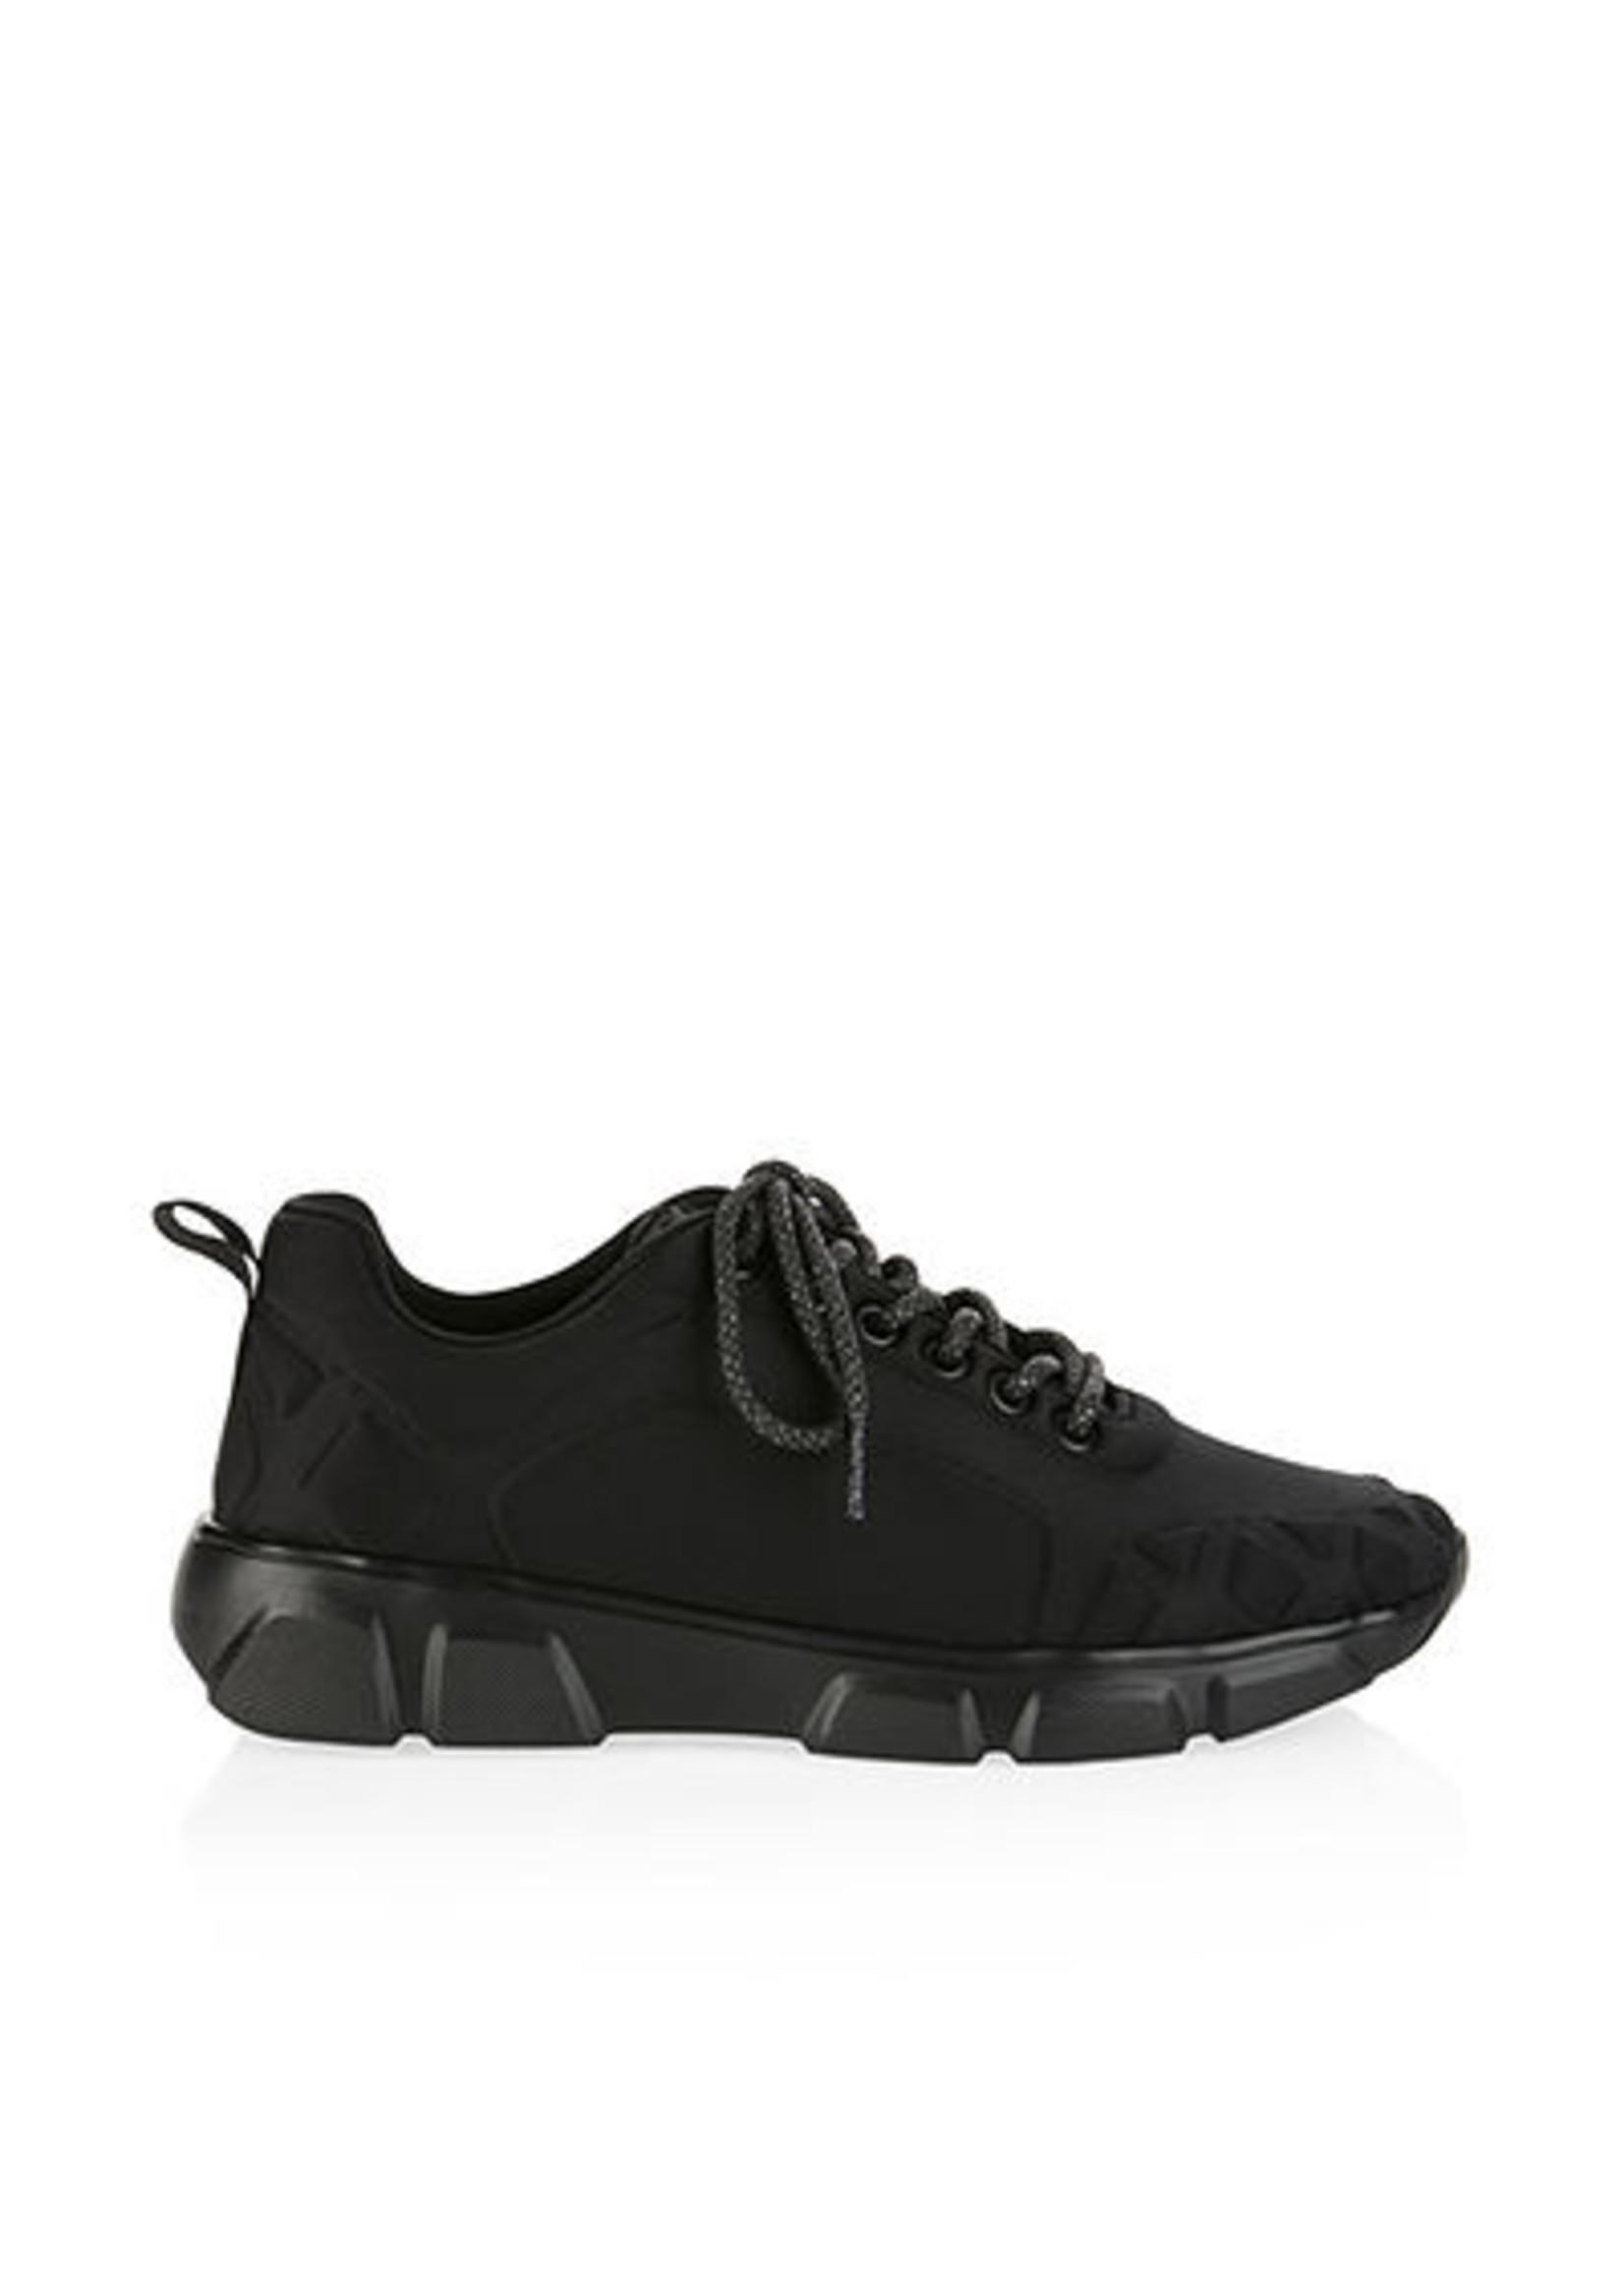 Marccain Bags & Shoes Sneaker RB SH.05 J03 black